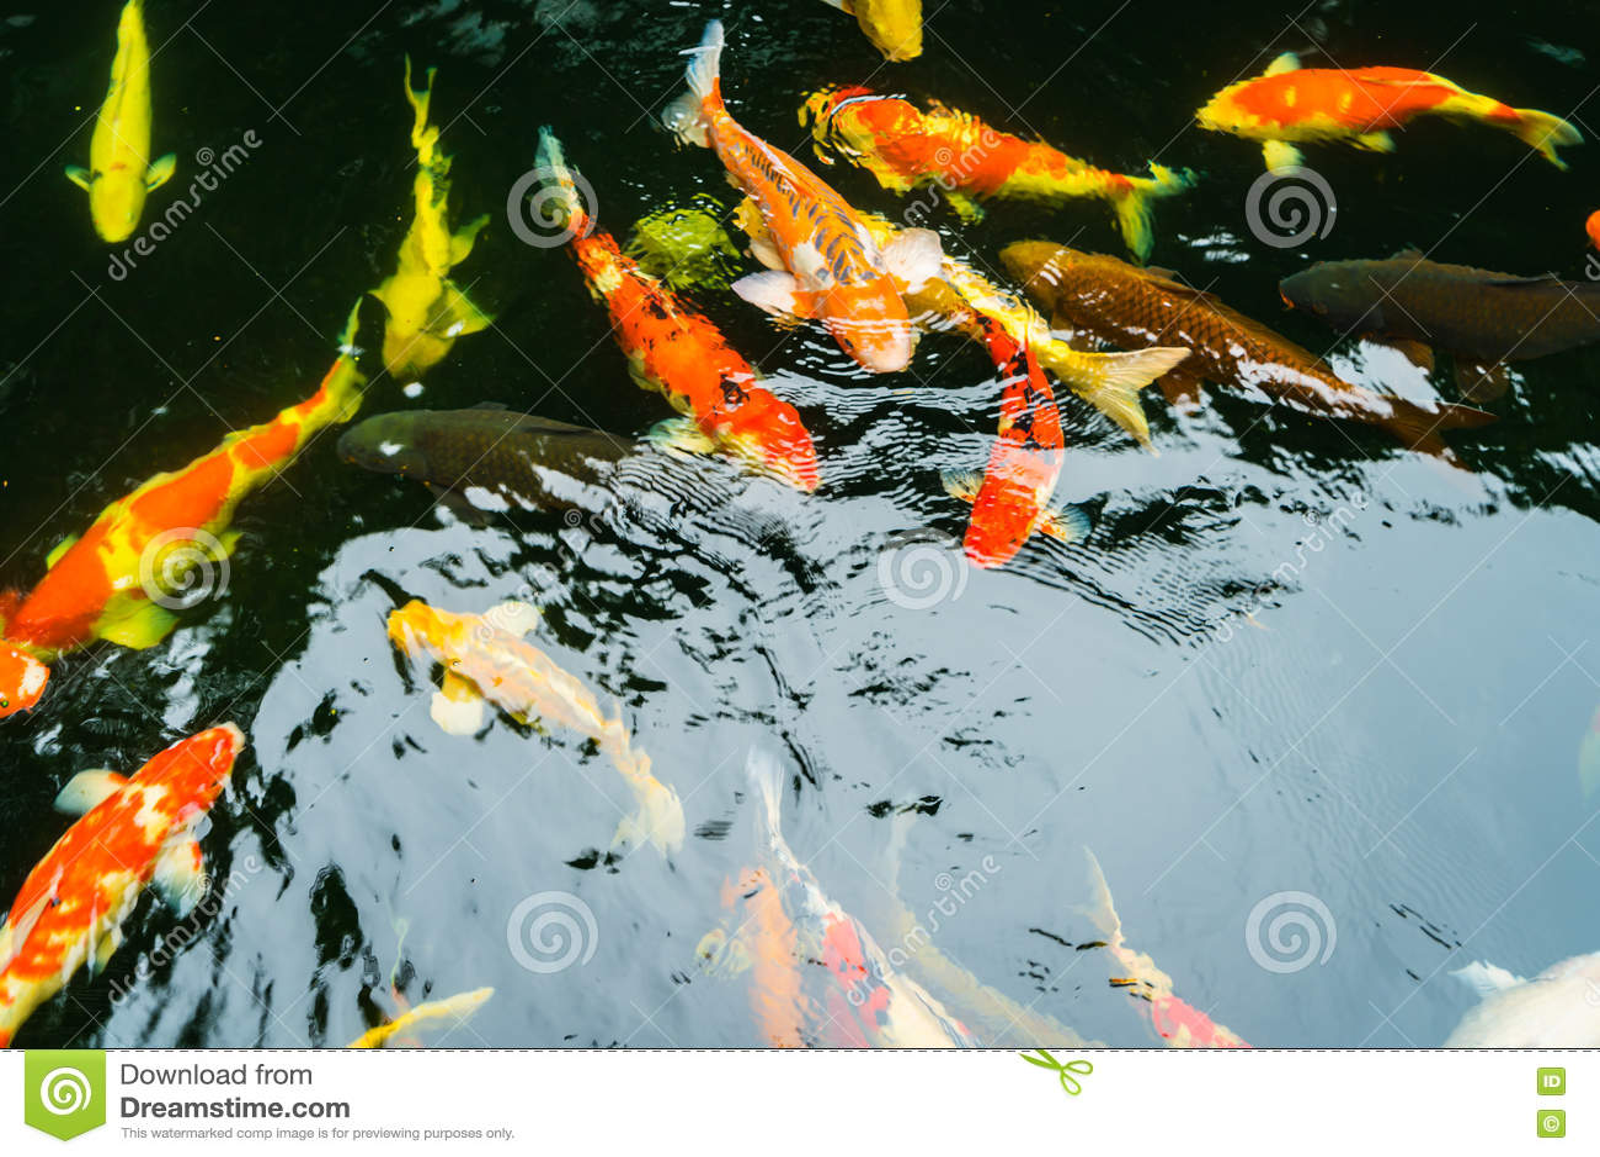 Colorful koi fish swimming in water stock image for Koi fish swimming